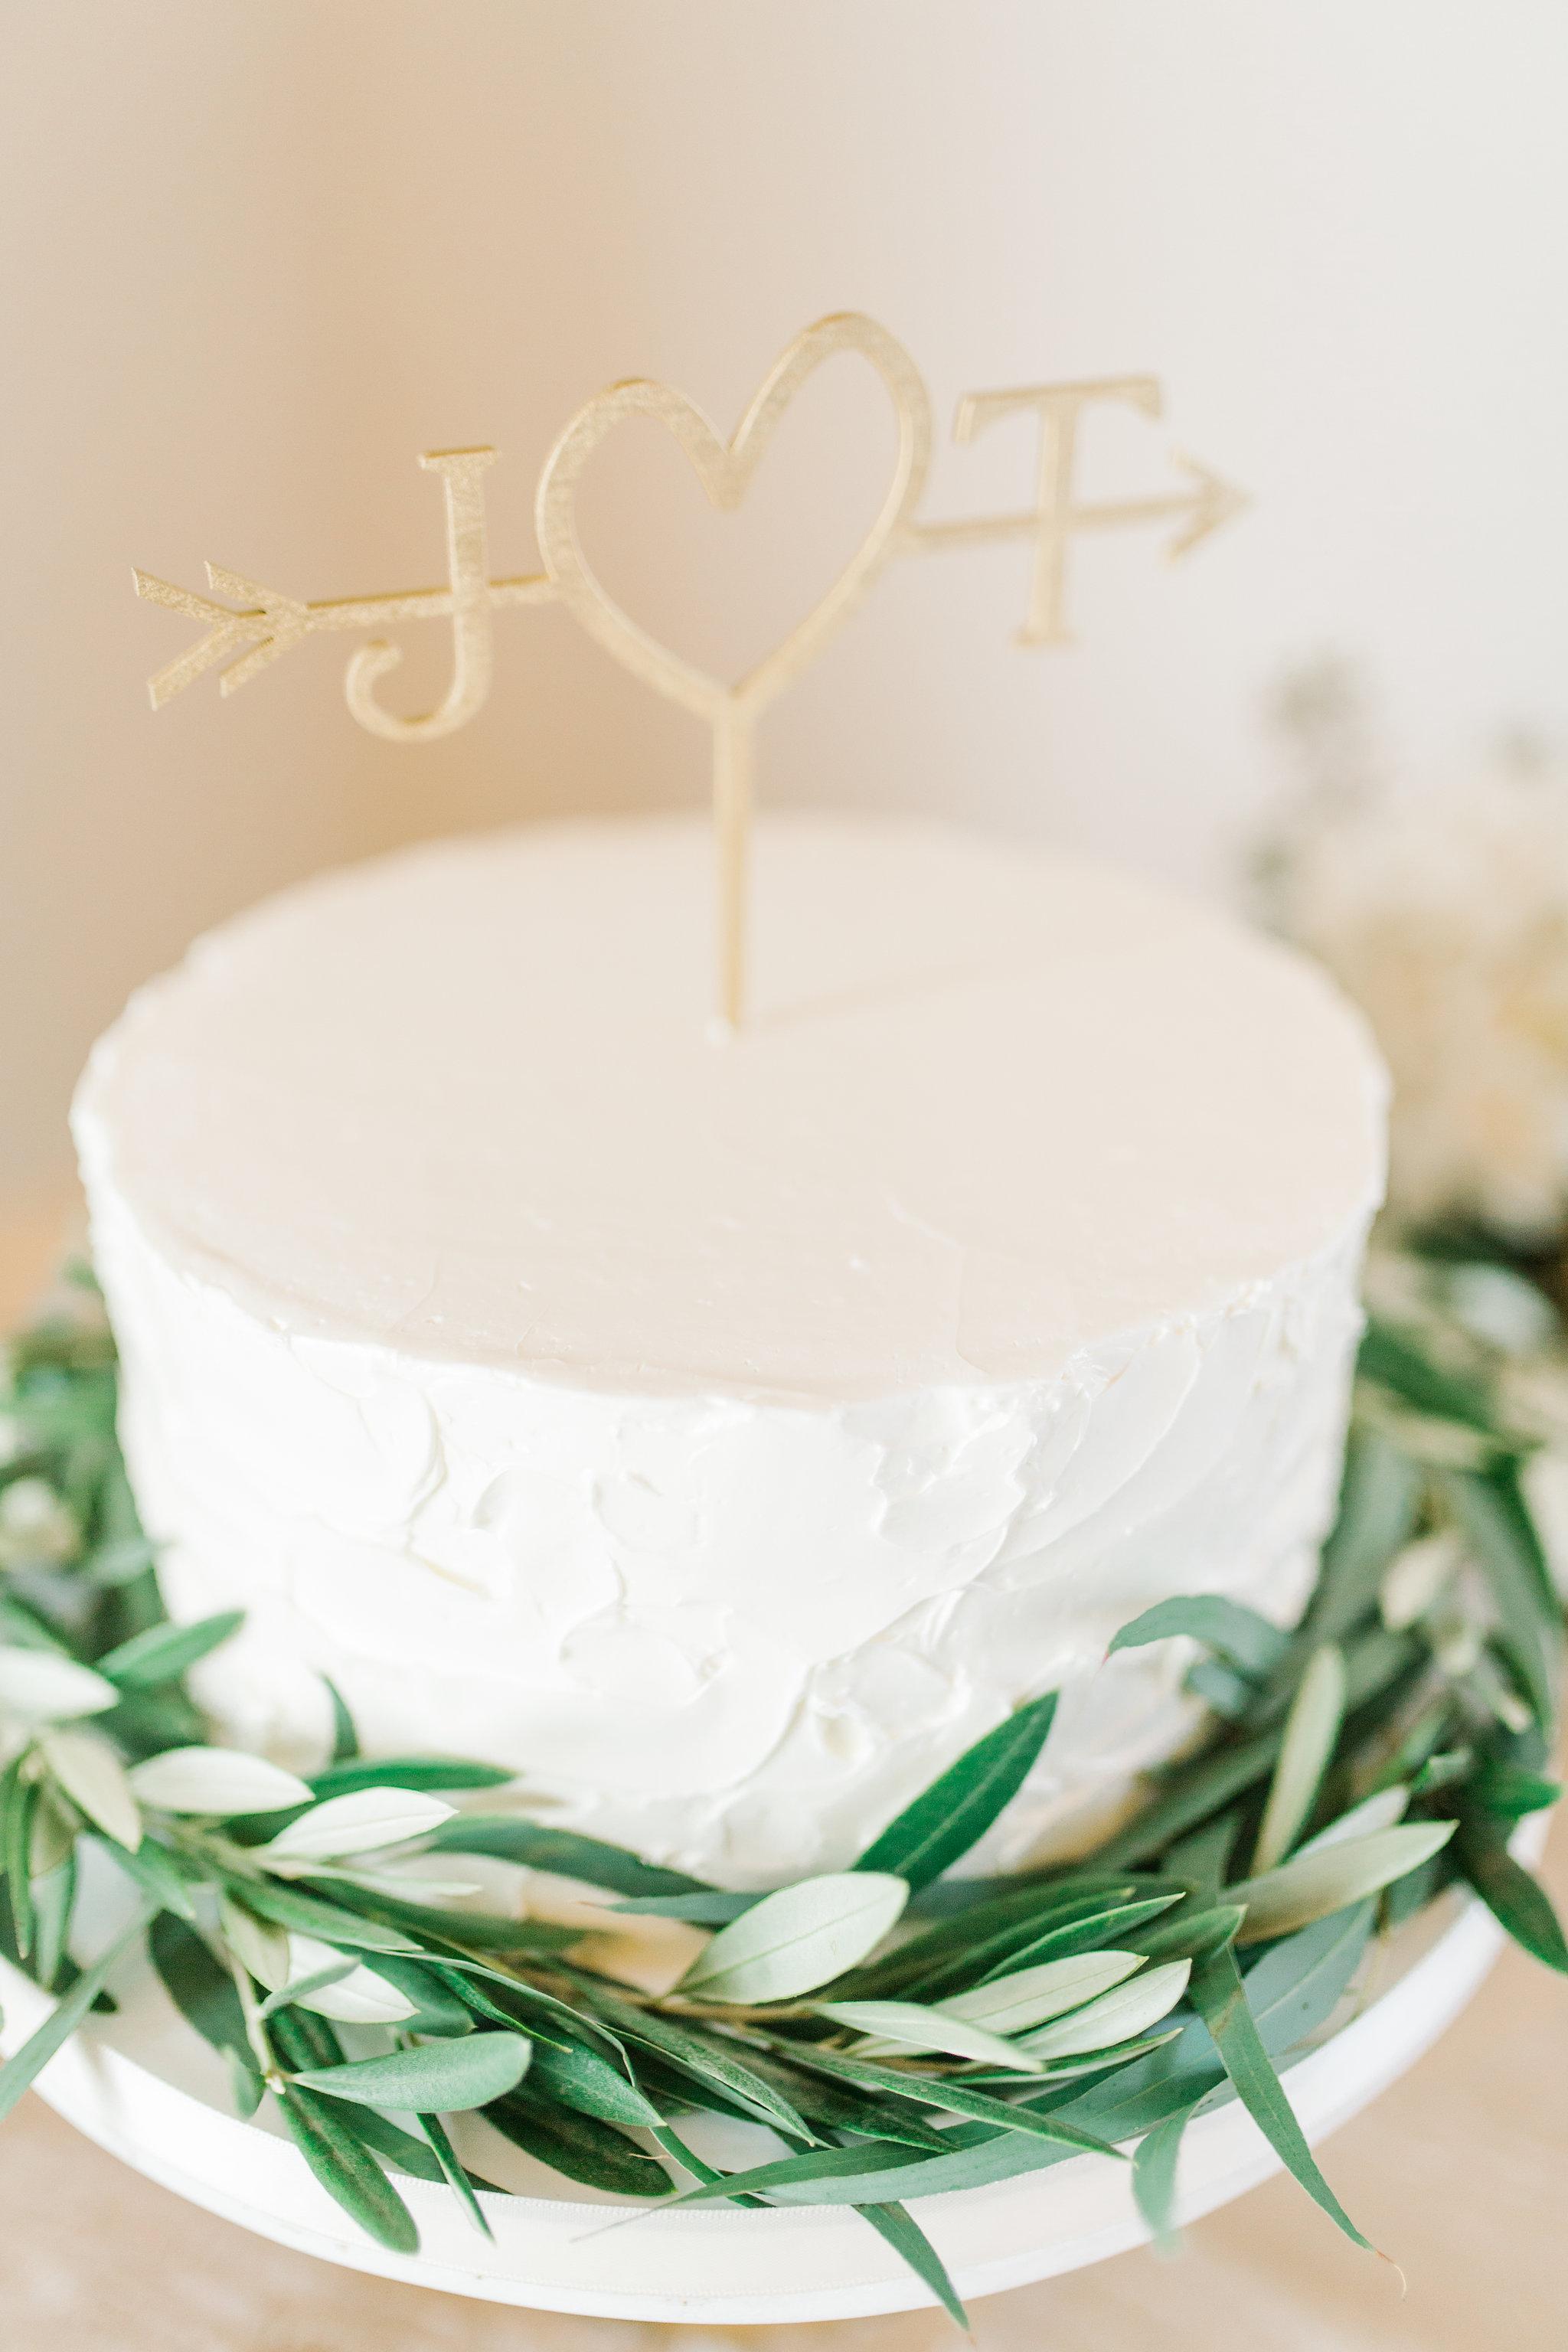 San Clemente, San clemente beach wedding, the casino san clemente, simple wedding cake olive greens, initial wedding cake topper, minimalist wedding cake